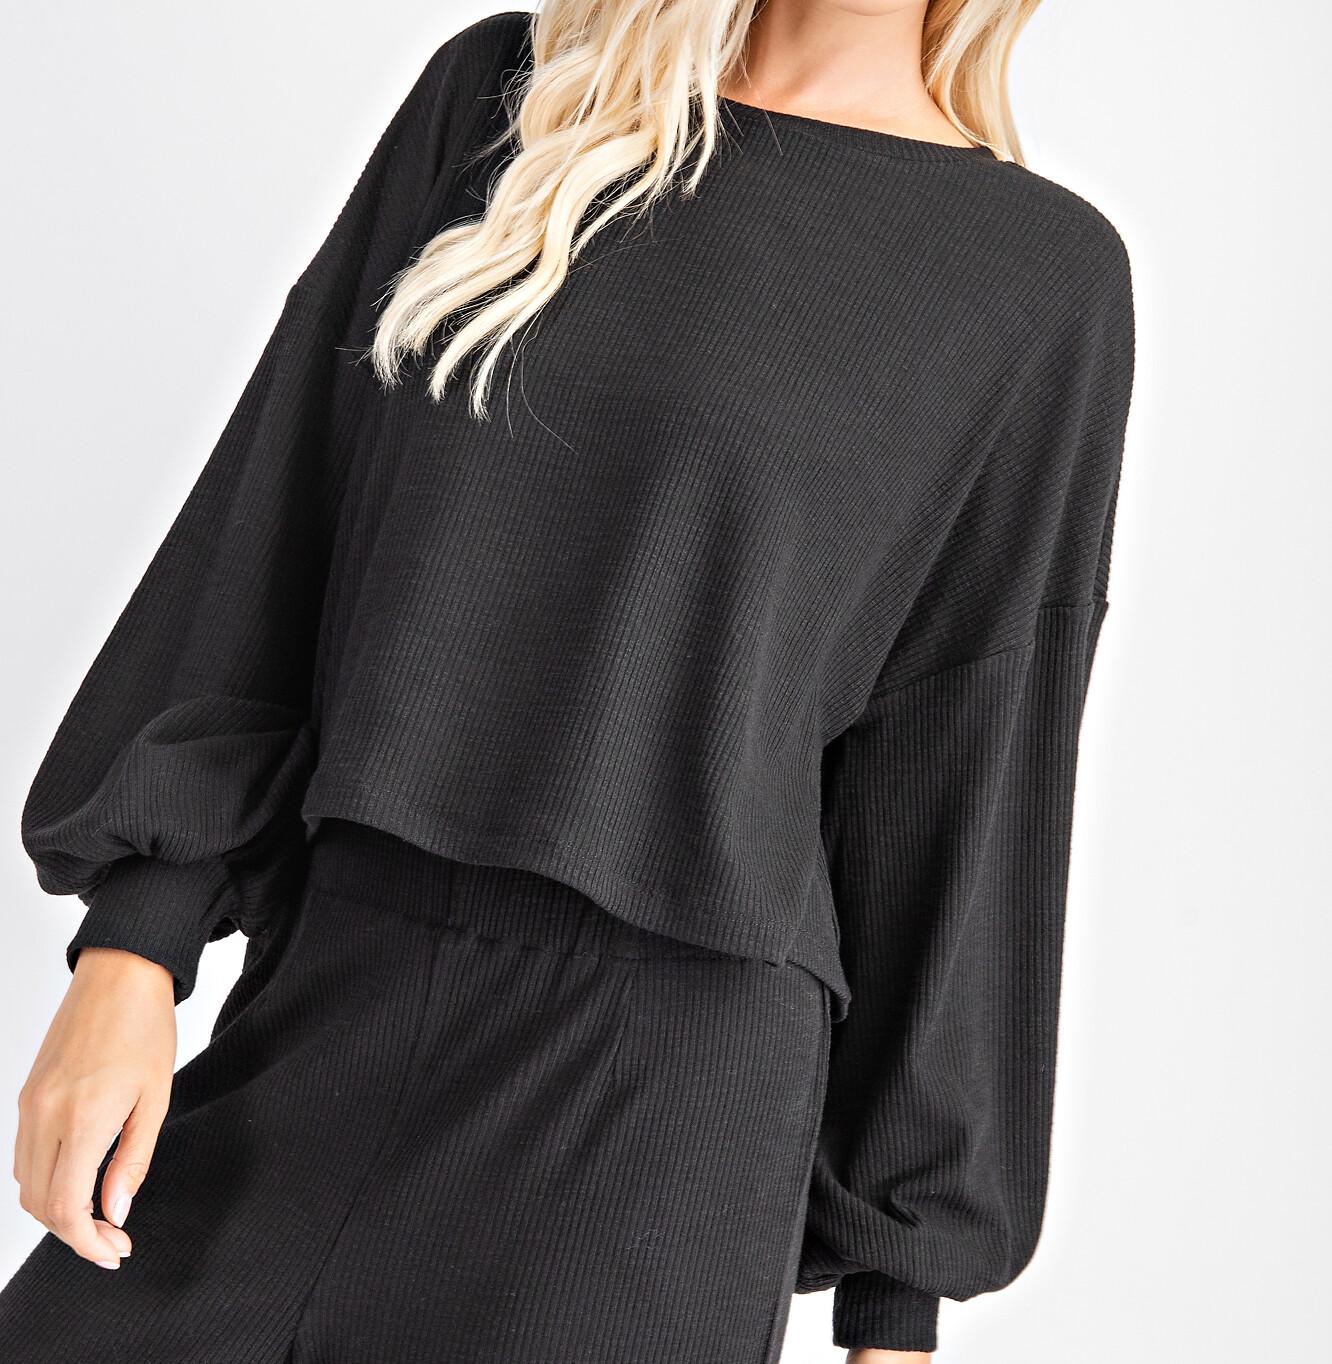 Rib Knit Pullover Sweater - GT2056